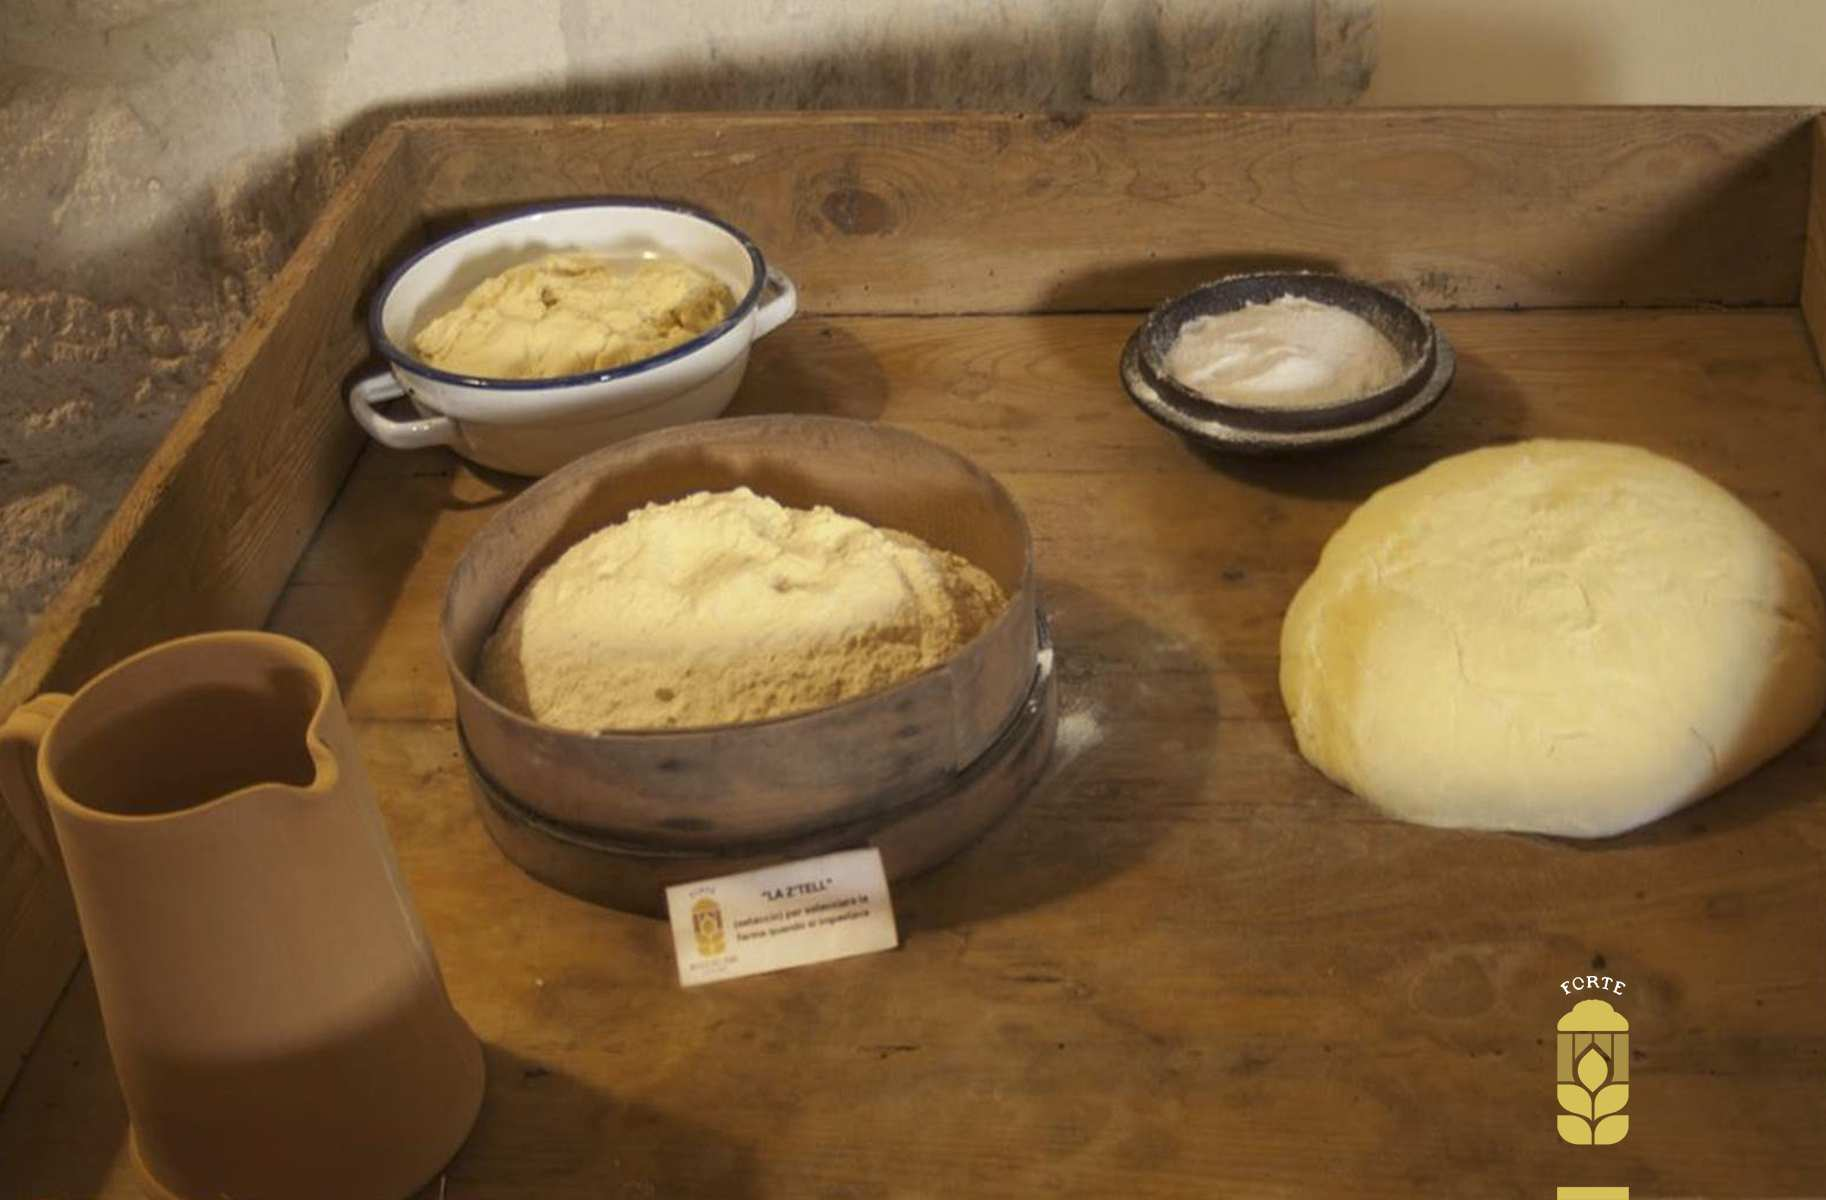 museo del pane altamura